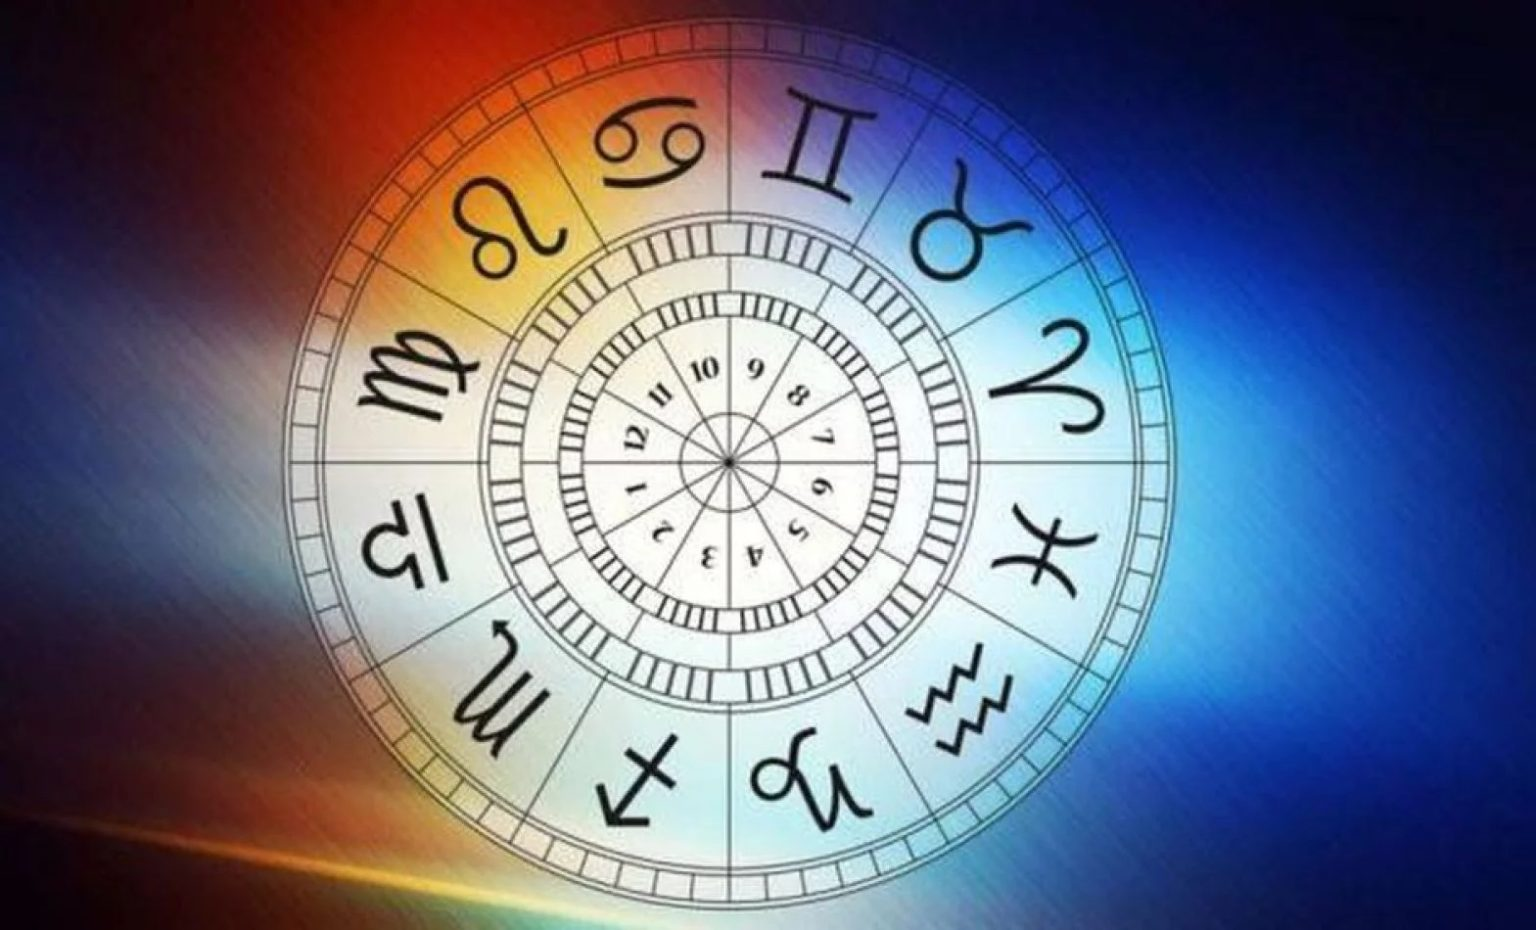 Tu horóscopo para este martes 26 de noviembre de 2019